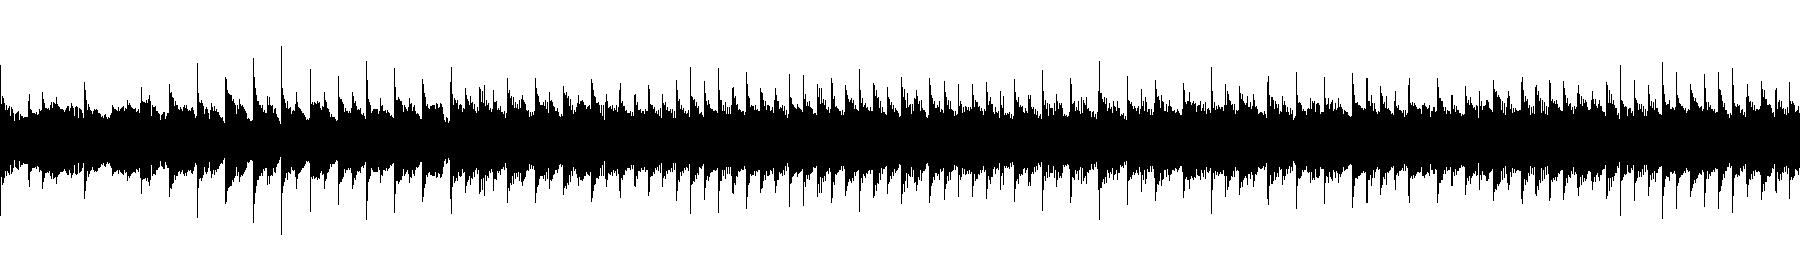 106 d organhits sp 01